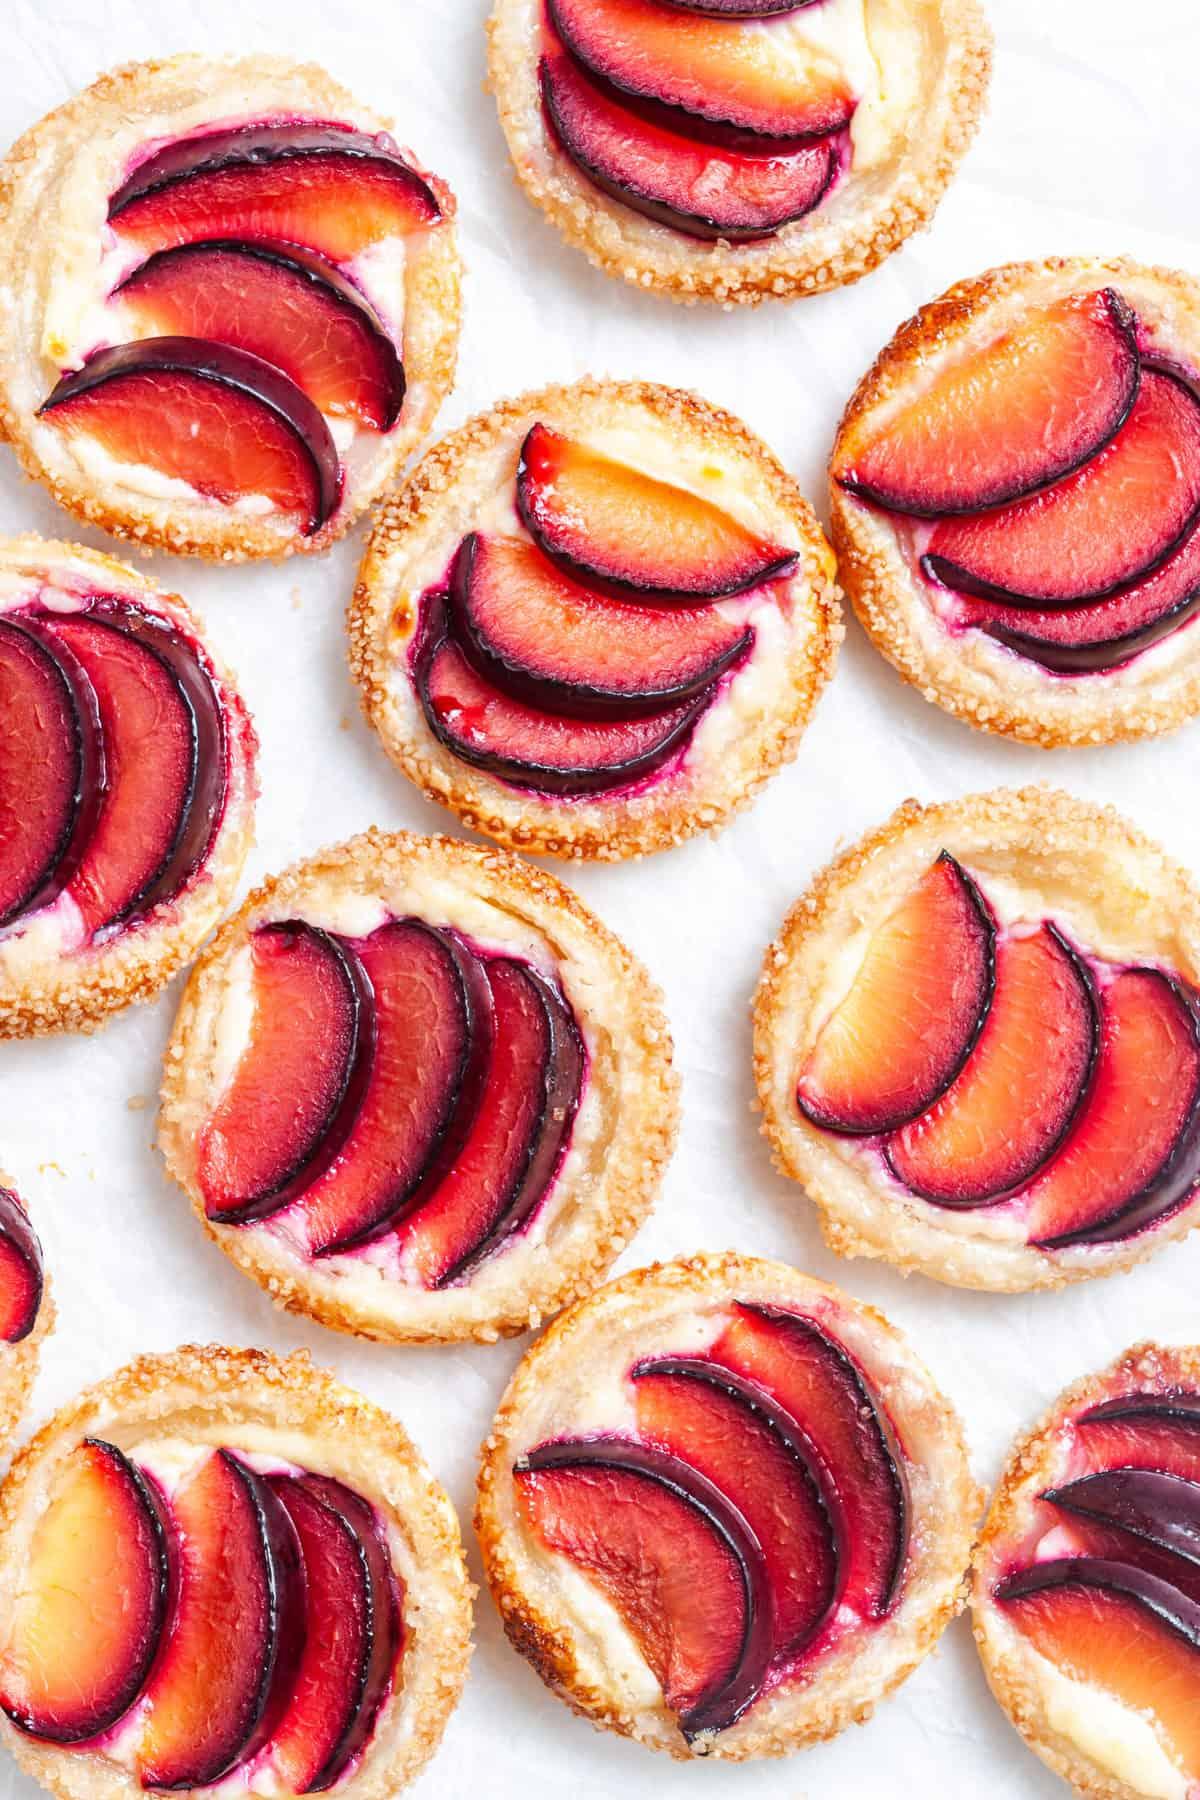 up close shot of tarts on baking paper.